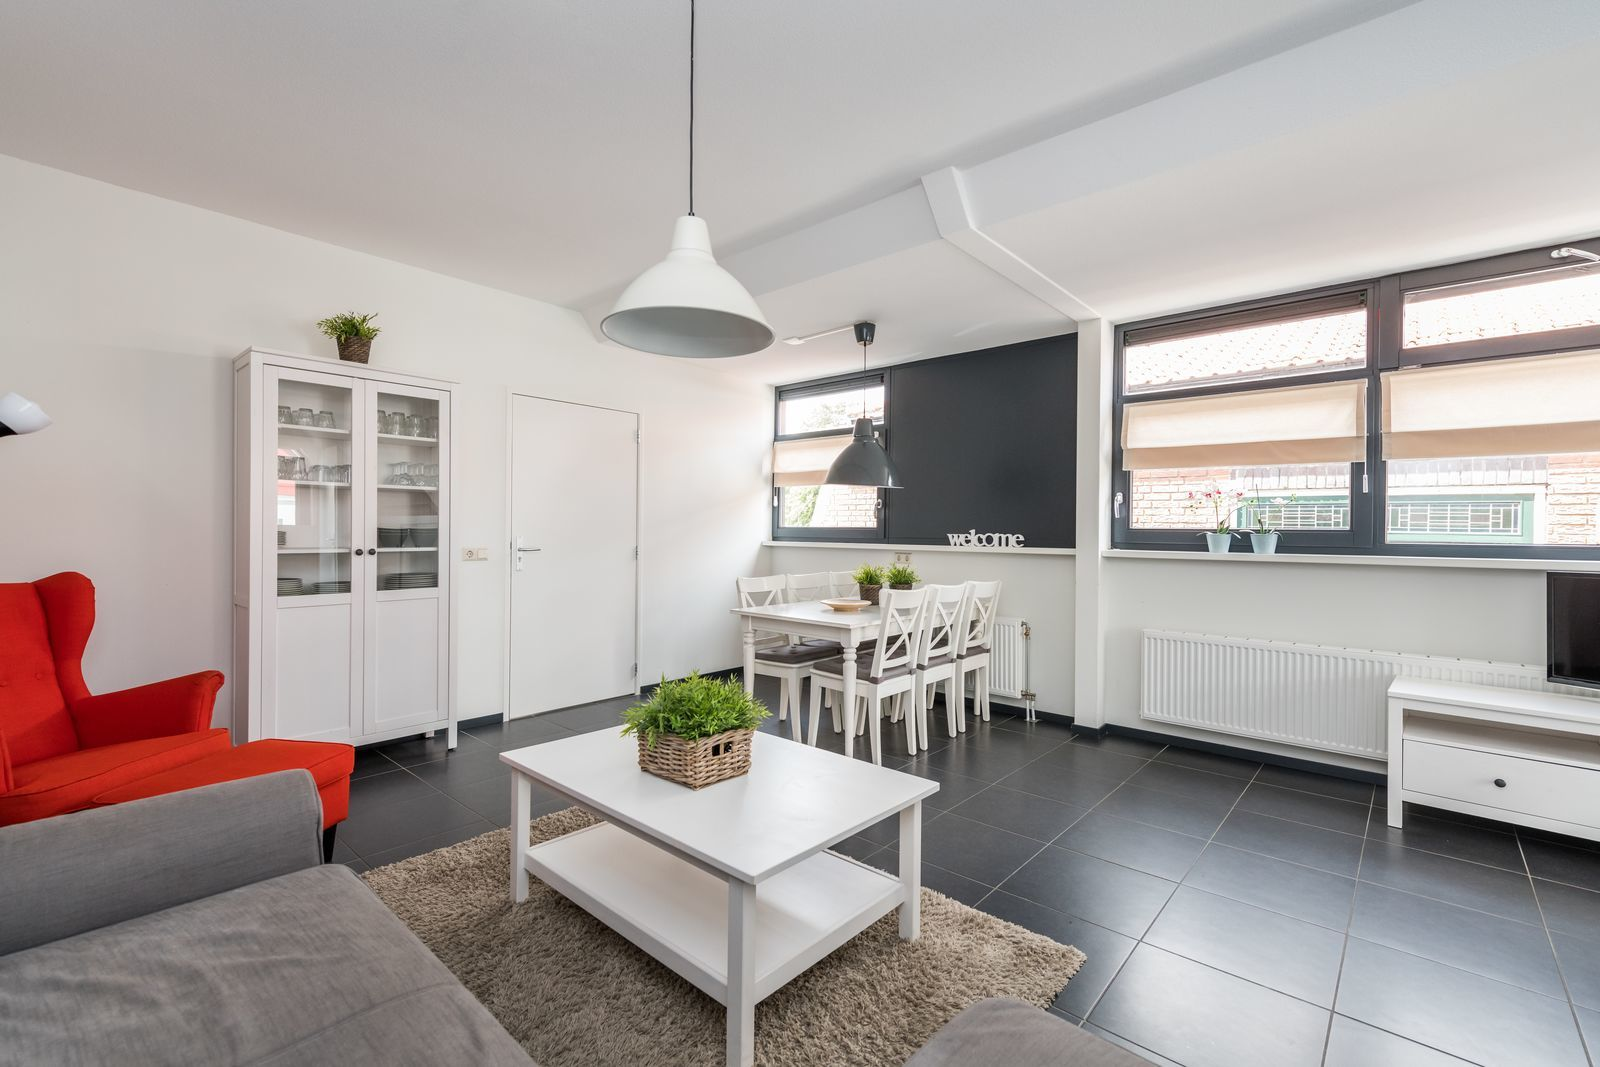 Appartement Zuid (6 personen) - Ouddorp